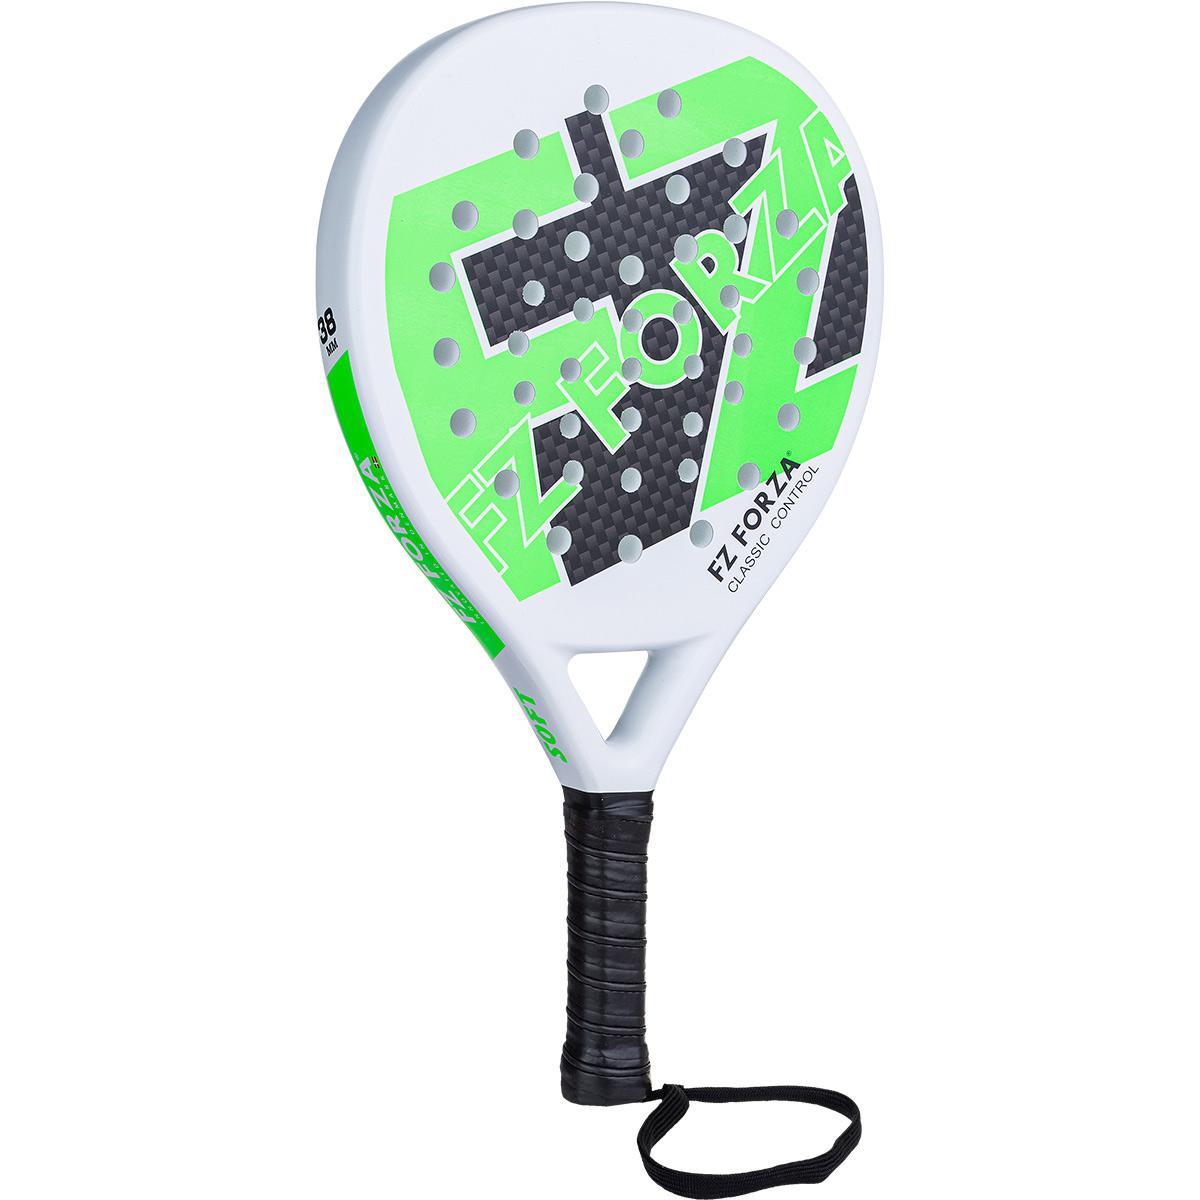 Forza  Padel Classic Control, padletennis, tennis